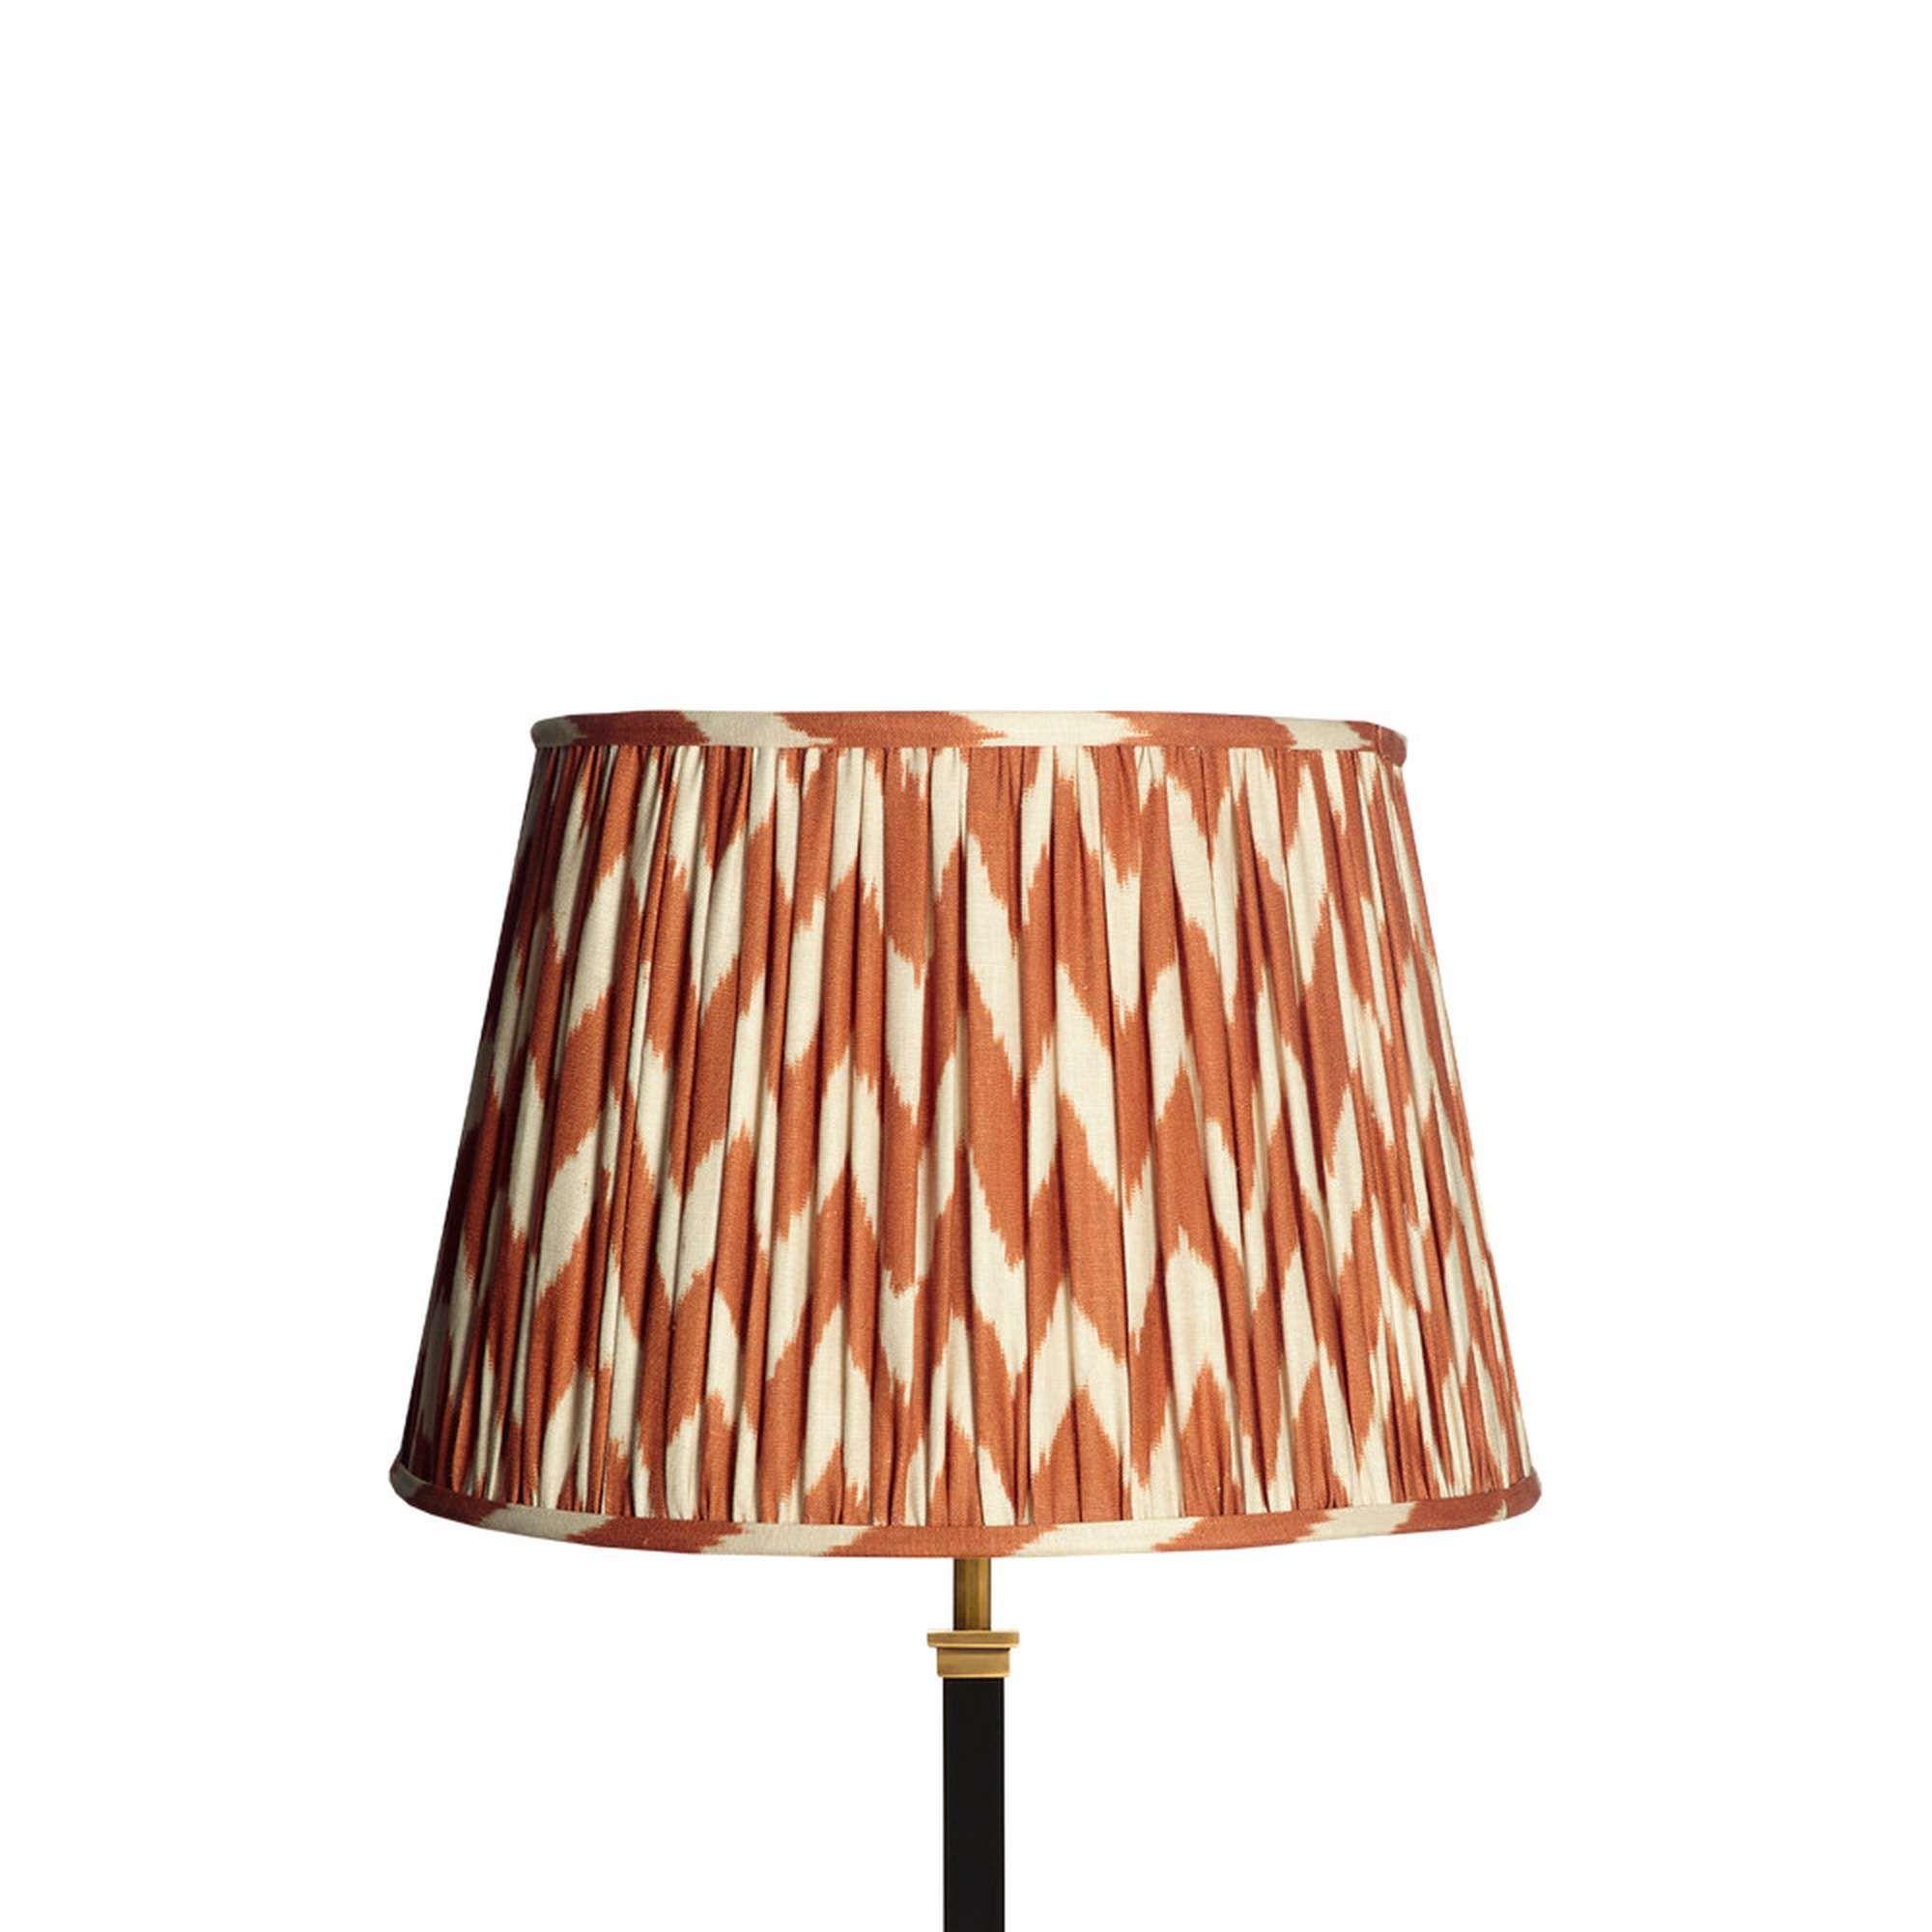 35cm Pleated Daun Cotton Lampshade